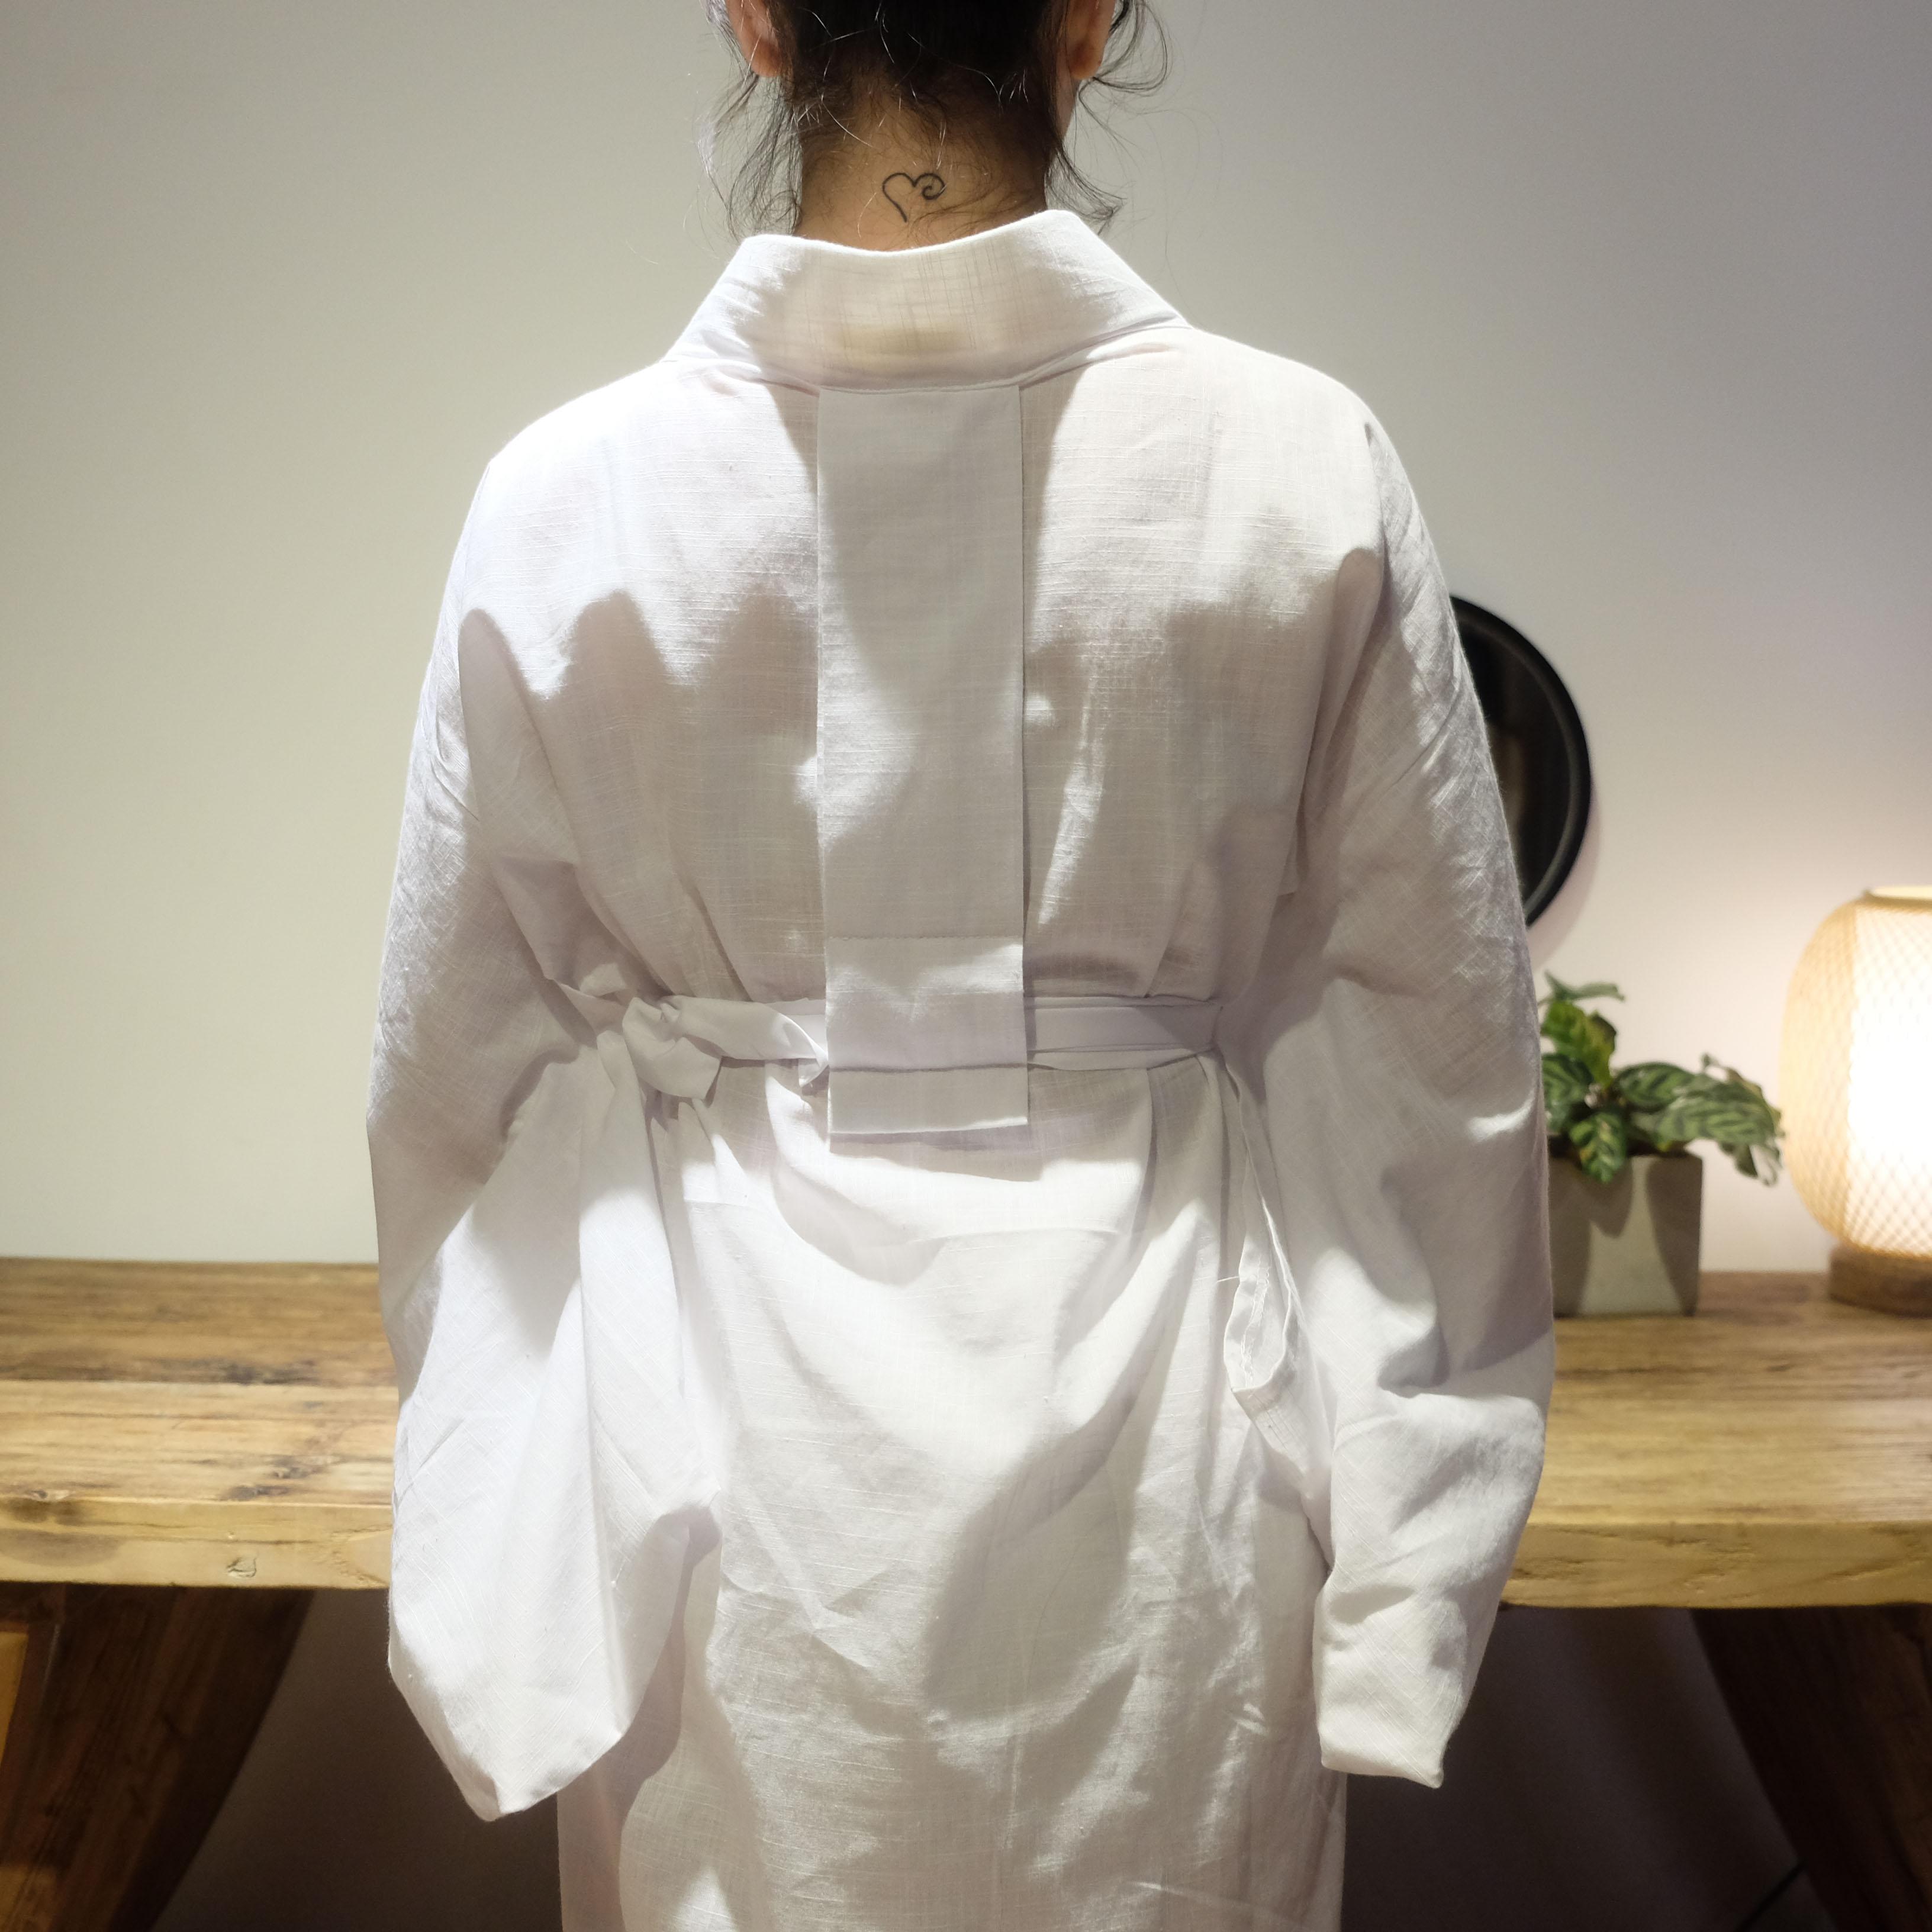 2019 Japanese Kimono Yukata Kimono Cardigan Dress Women Long Sleeve Cardigan Haori Traditional Kimonos Dress With Obi